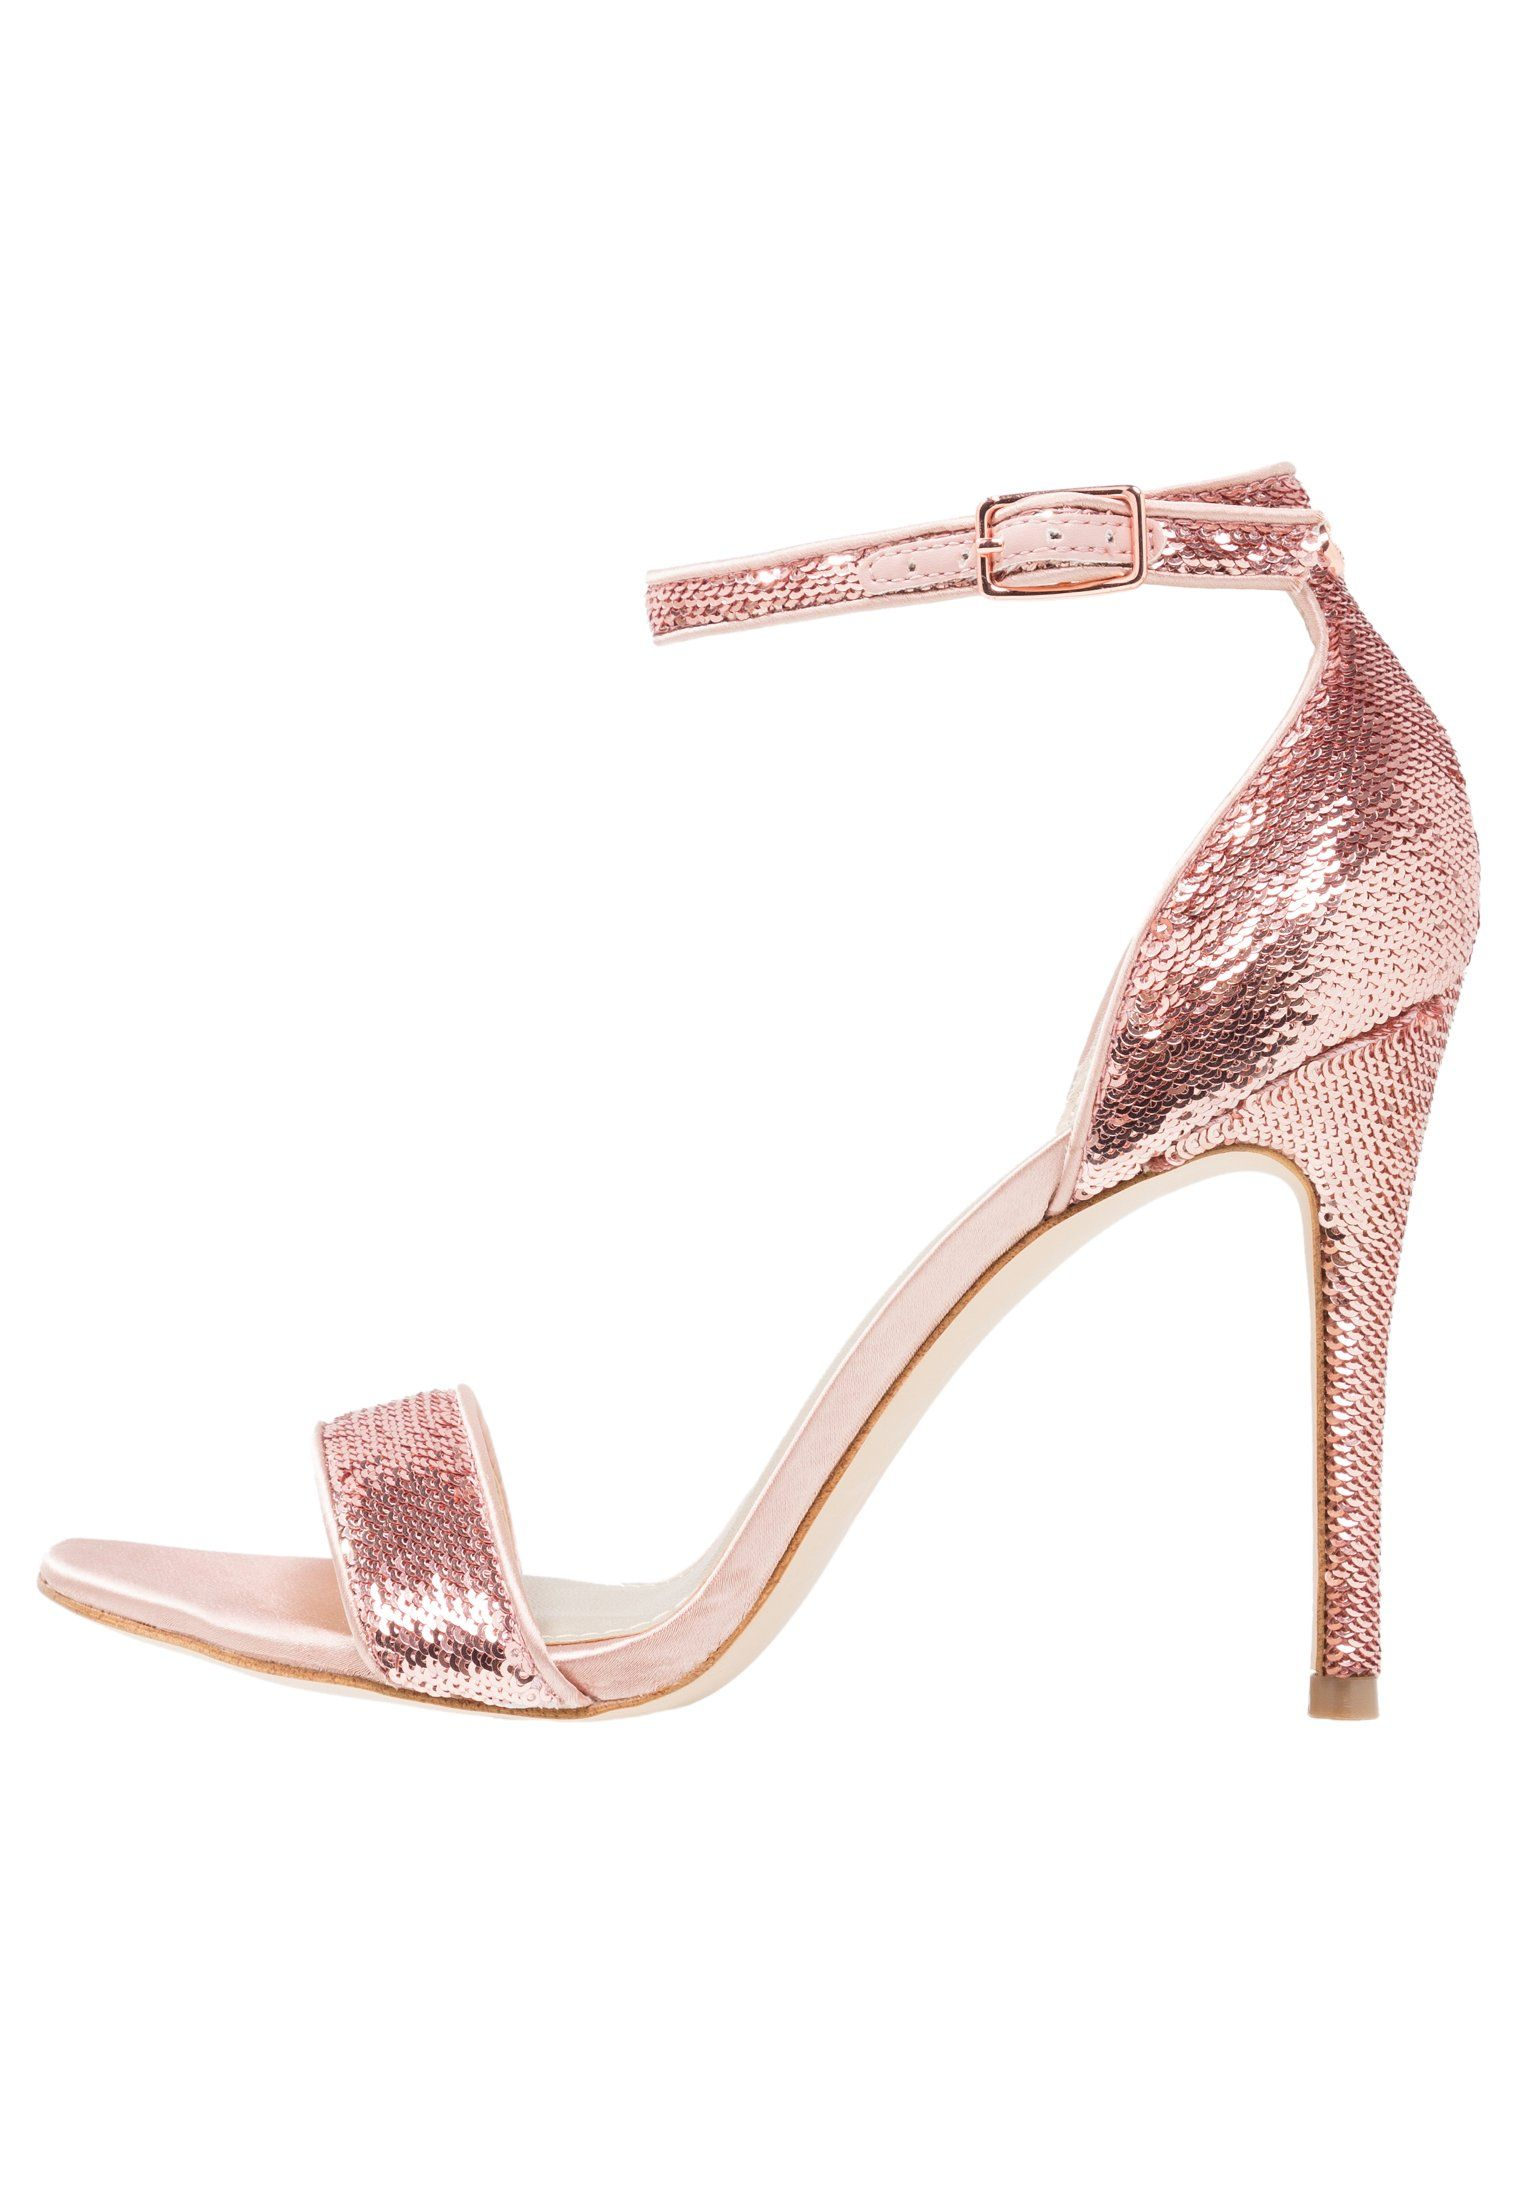 Zapatos Guess Karlily Pinterest Sandalias es Rose Zalando 7xTHUnwCqH